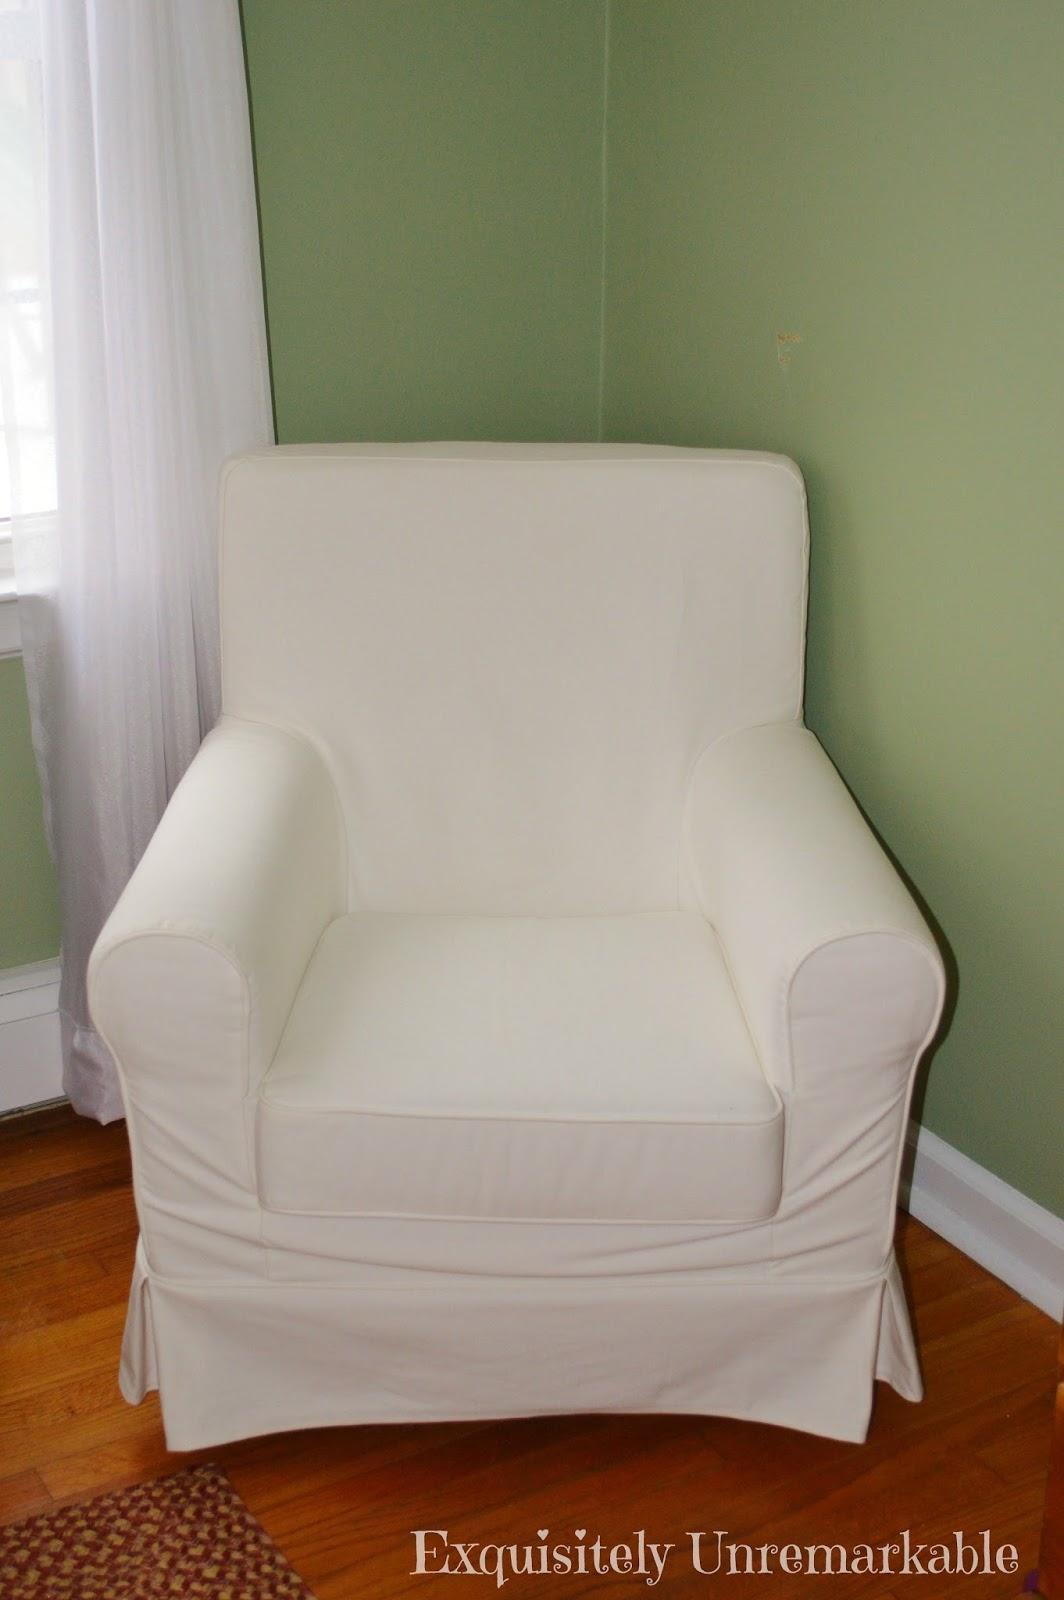 bedroom chair ikea bedroom. simple chair february 21 2014 on bedroom chair ikea h